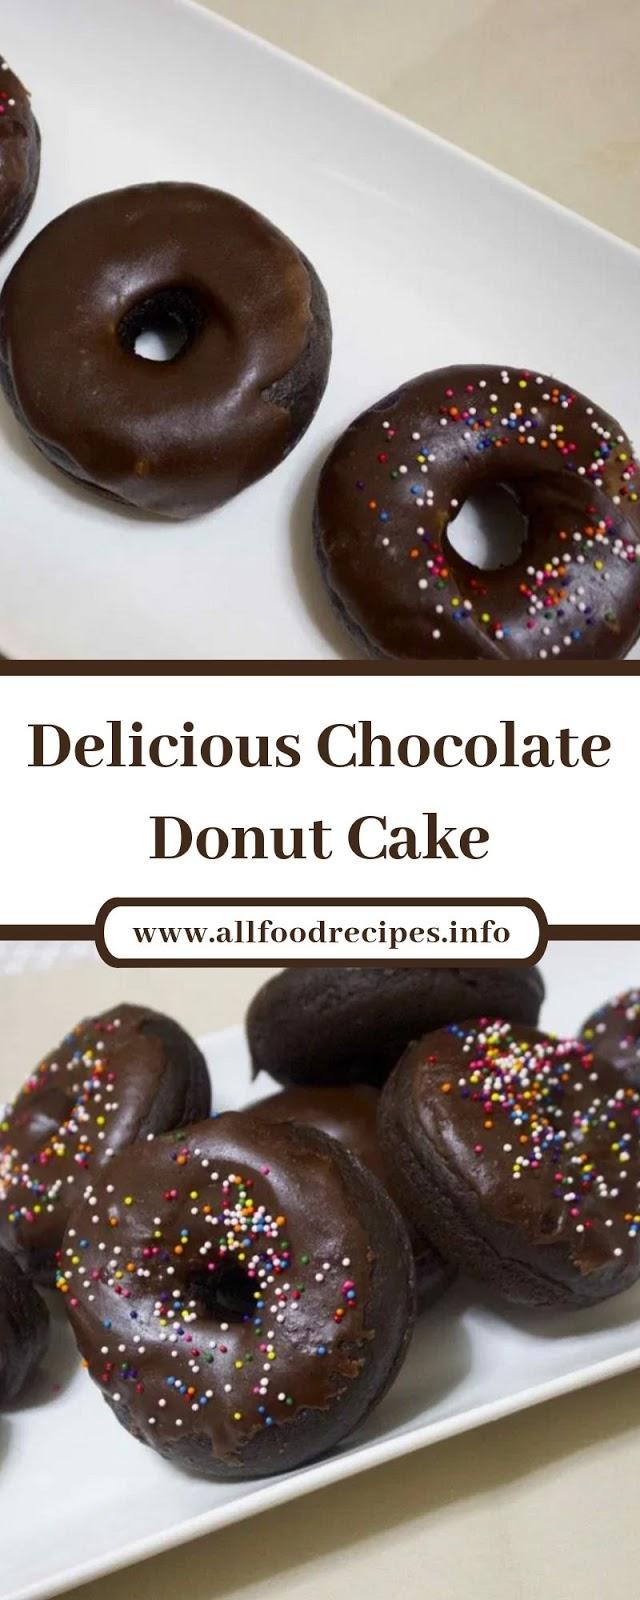 Delicious Chocolate Donut Cake